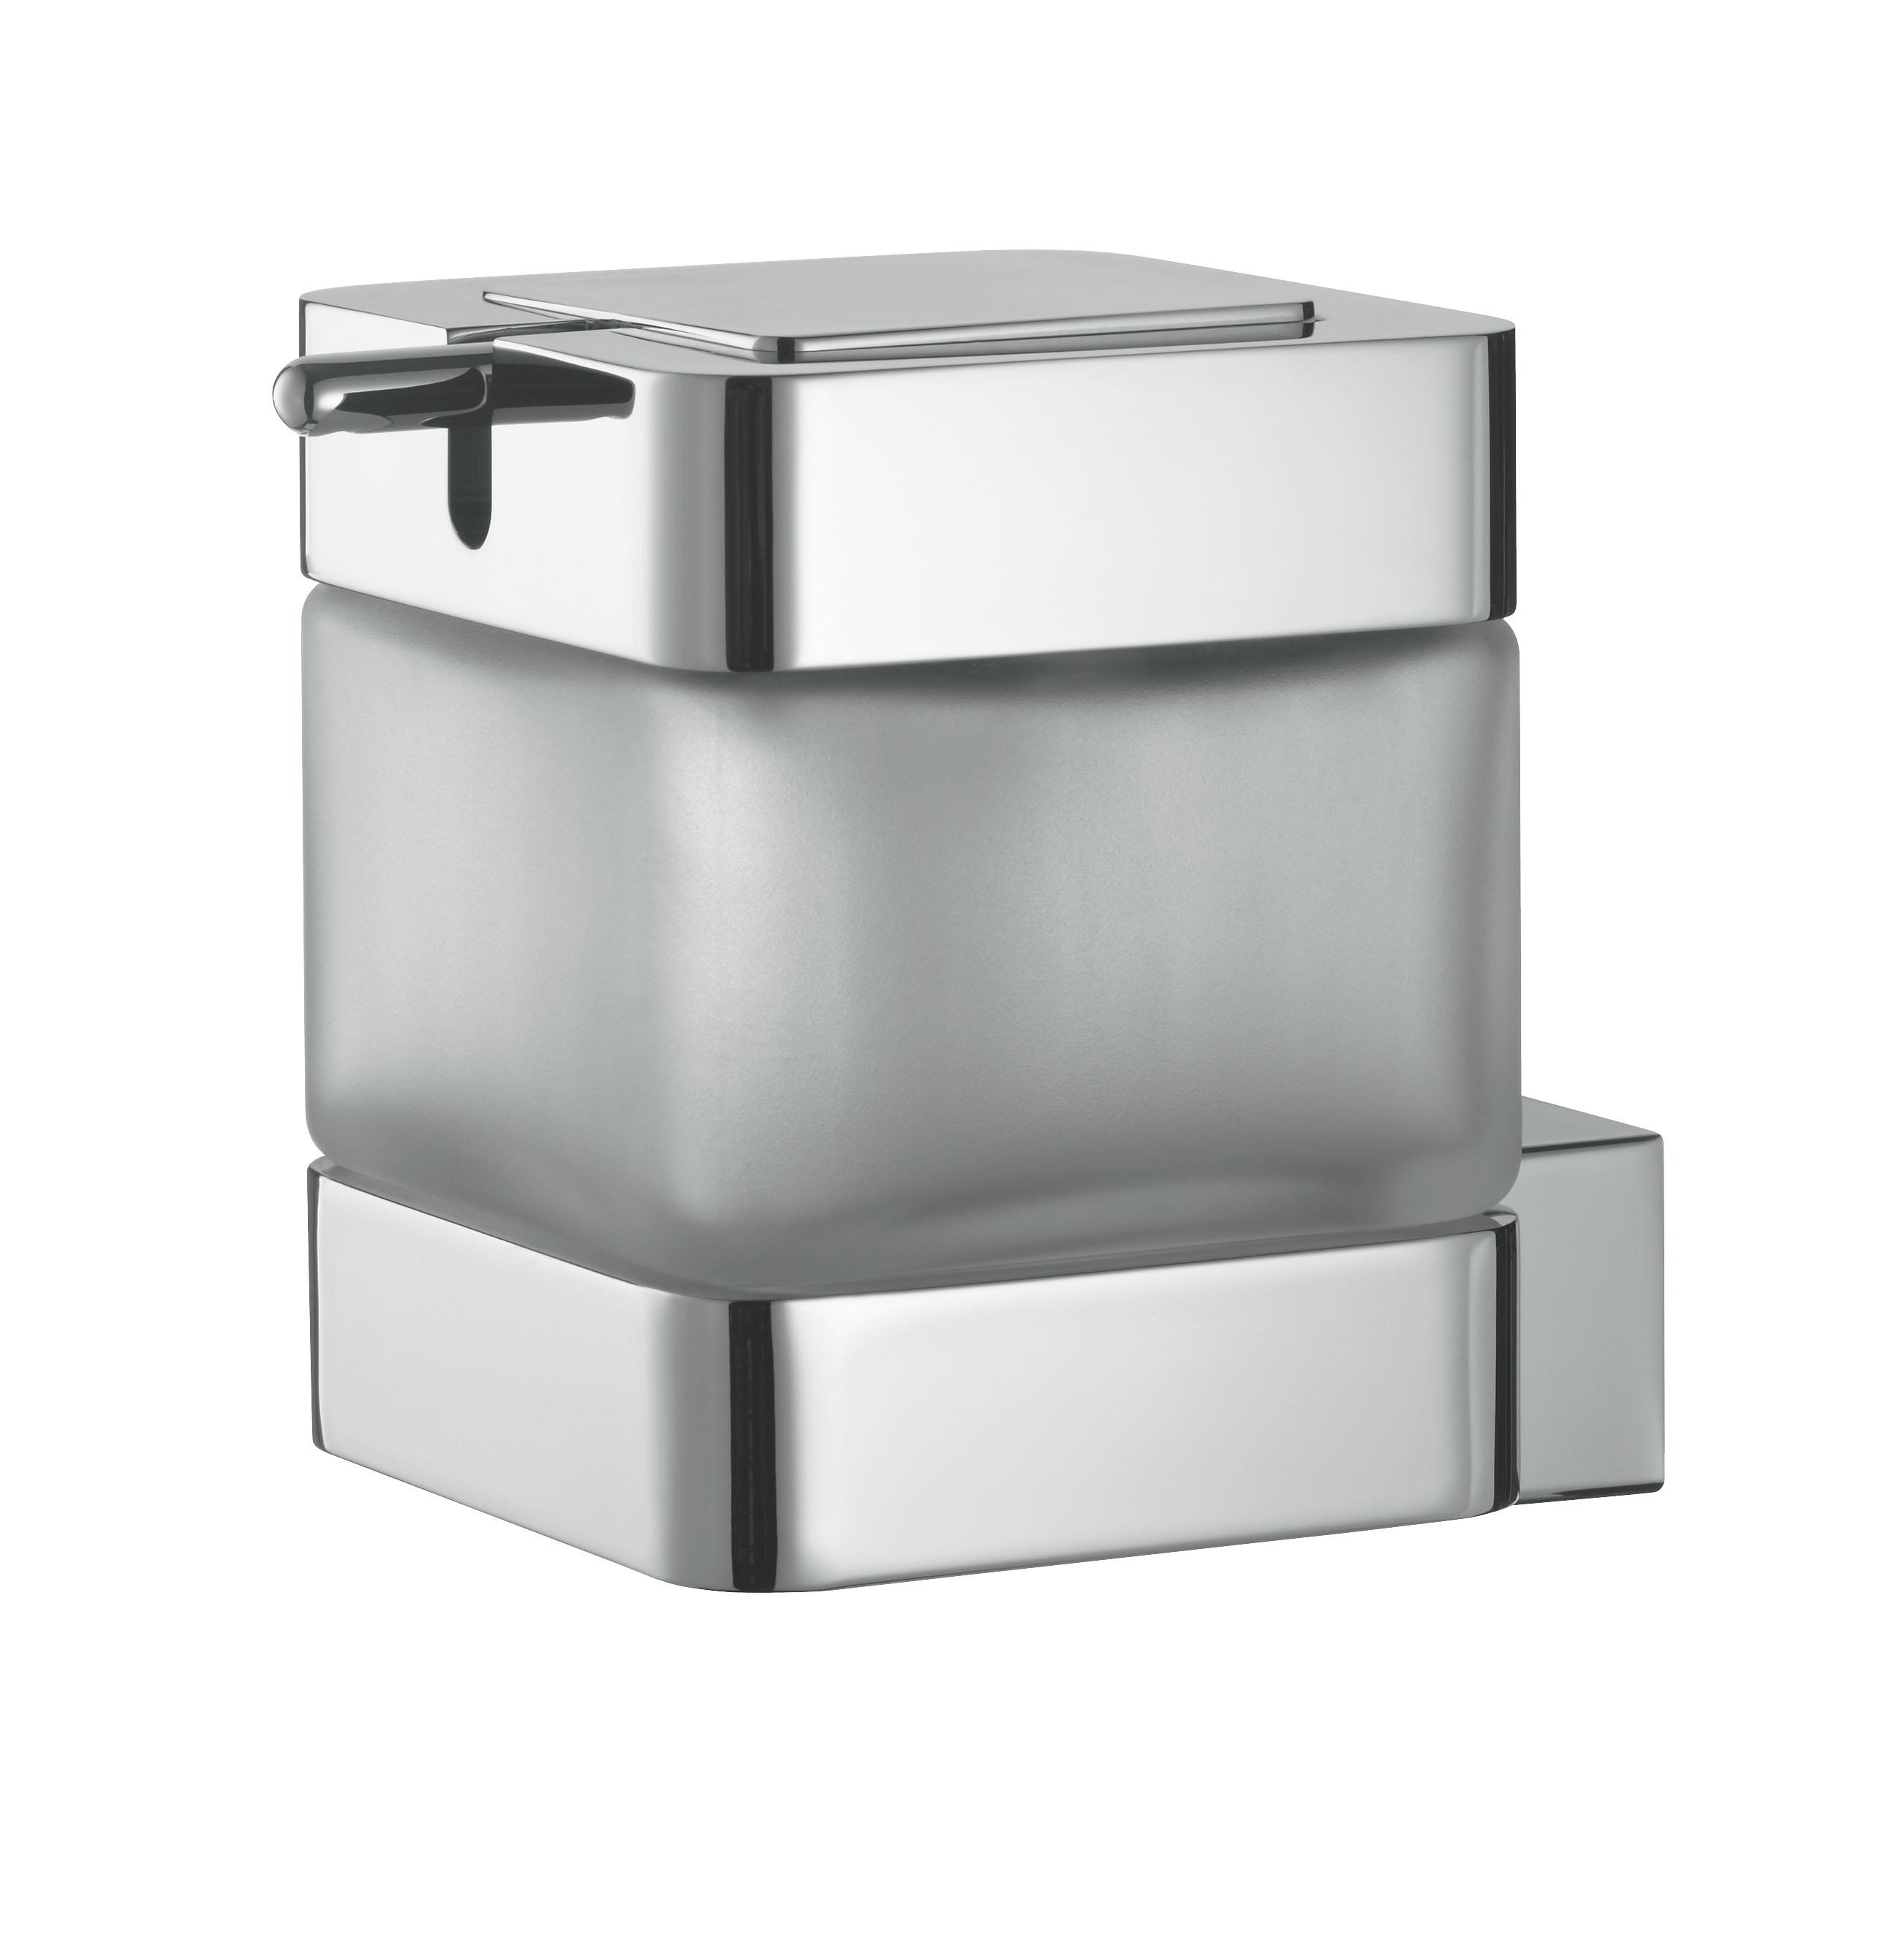 badshop veith seifenspender akua verchromt neu m glaseinsatz vigour vigour sanibel. Black Bedroom Furniture Sets. Home Design Ideas